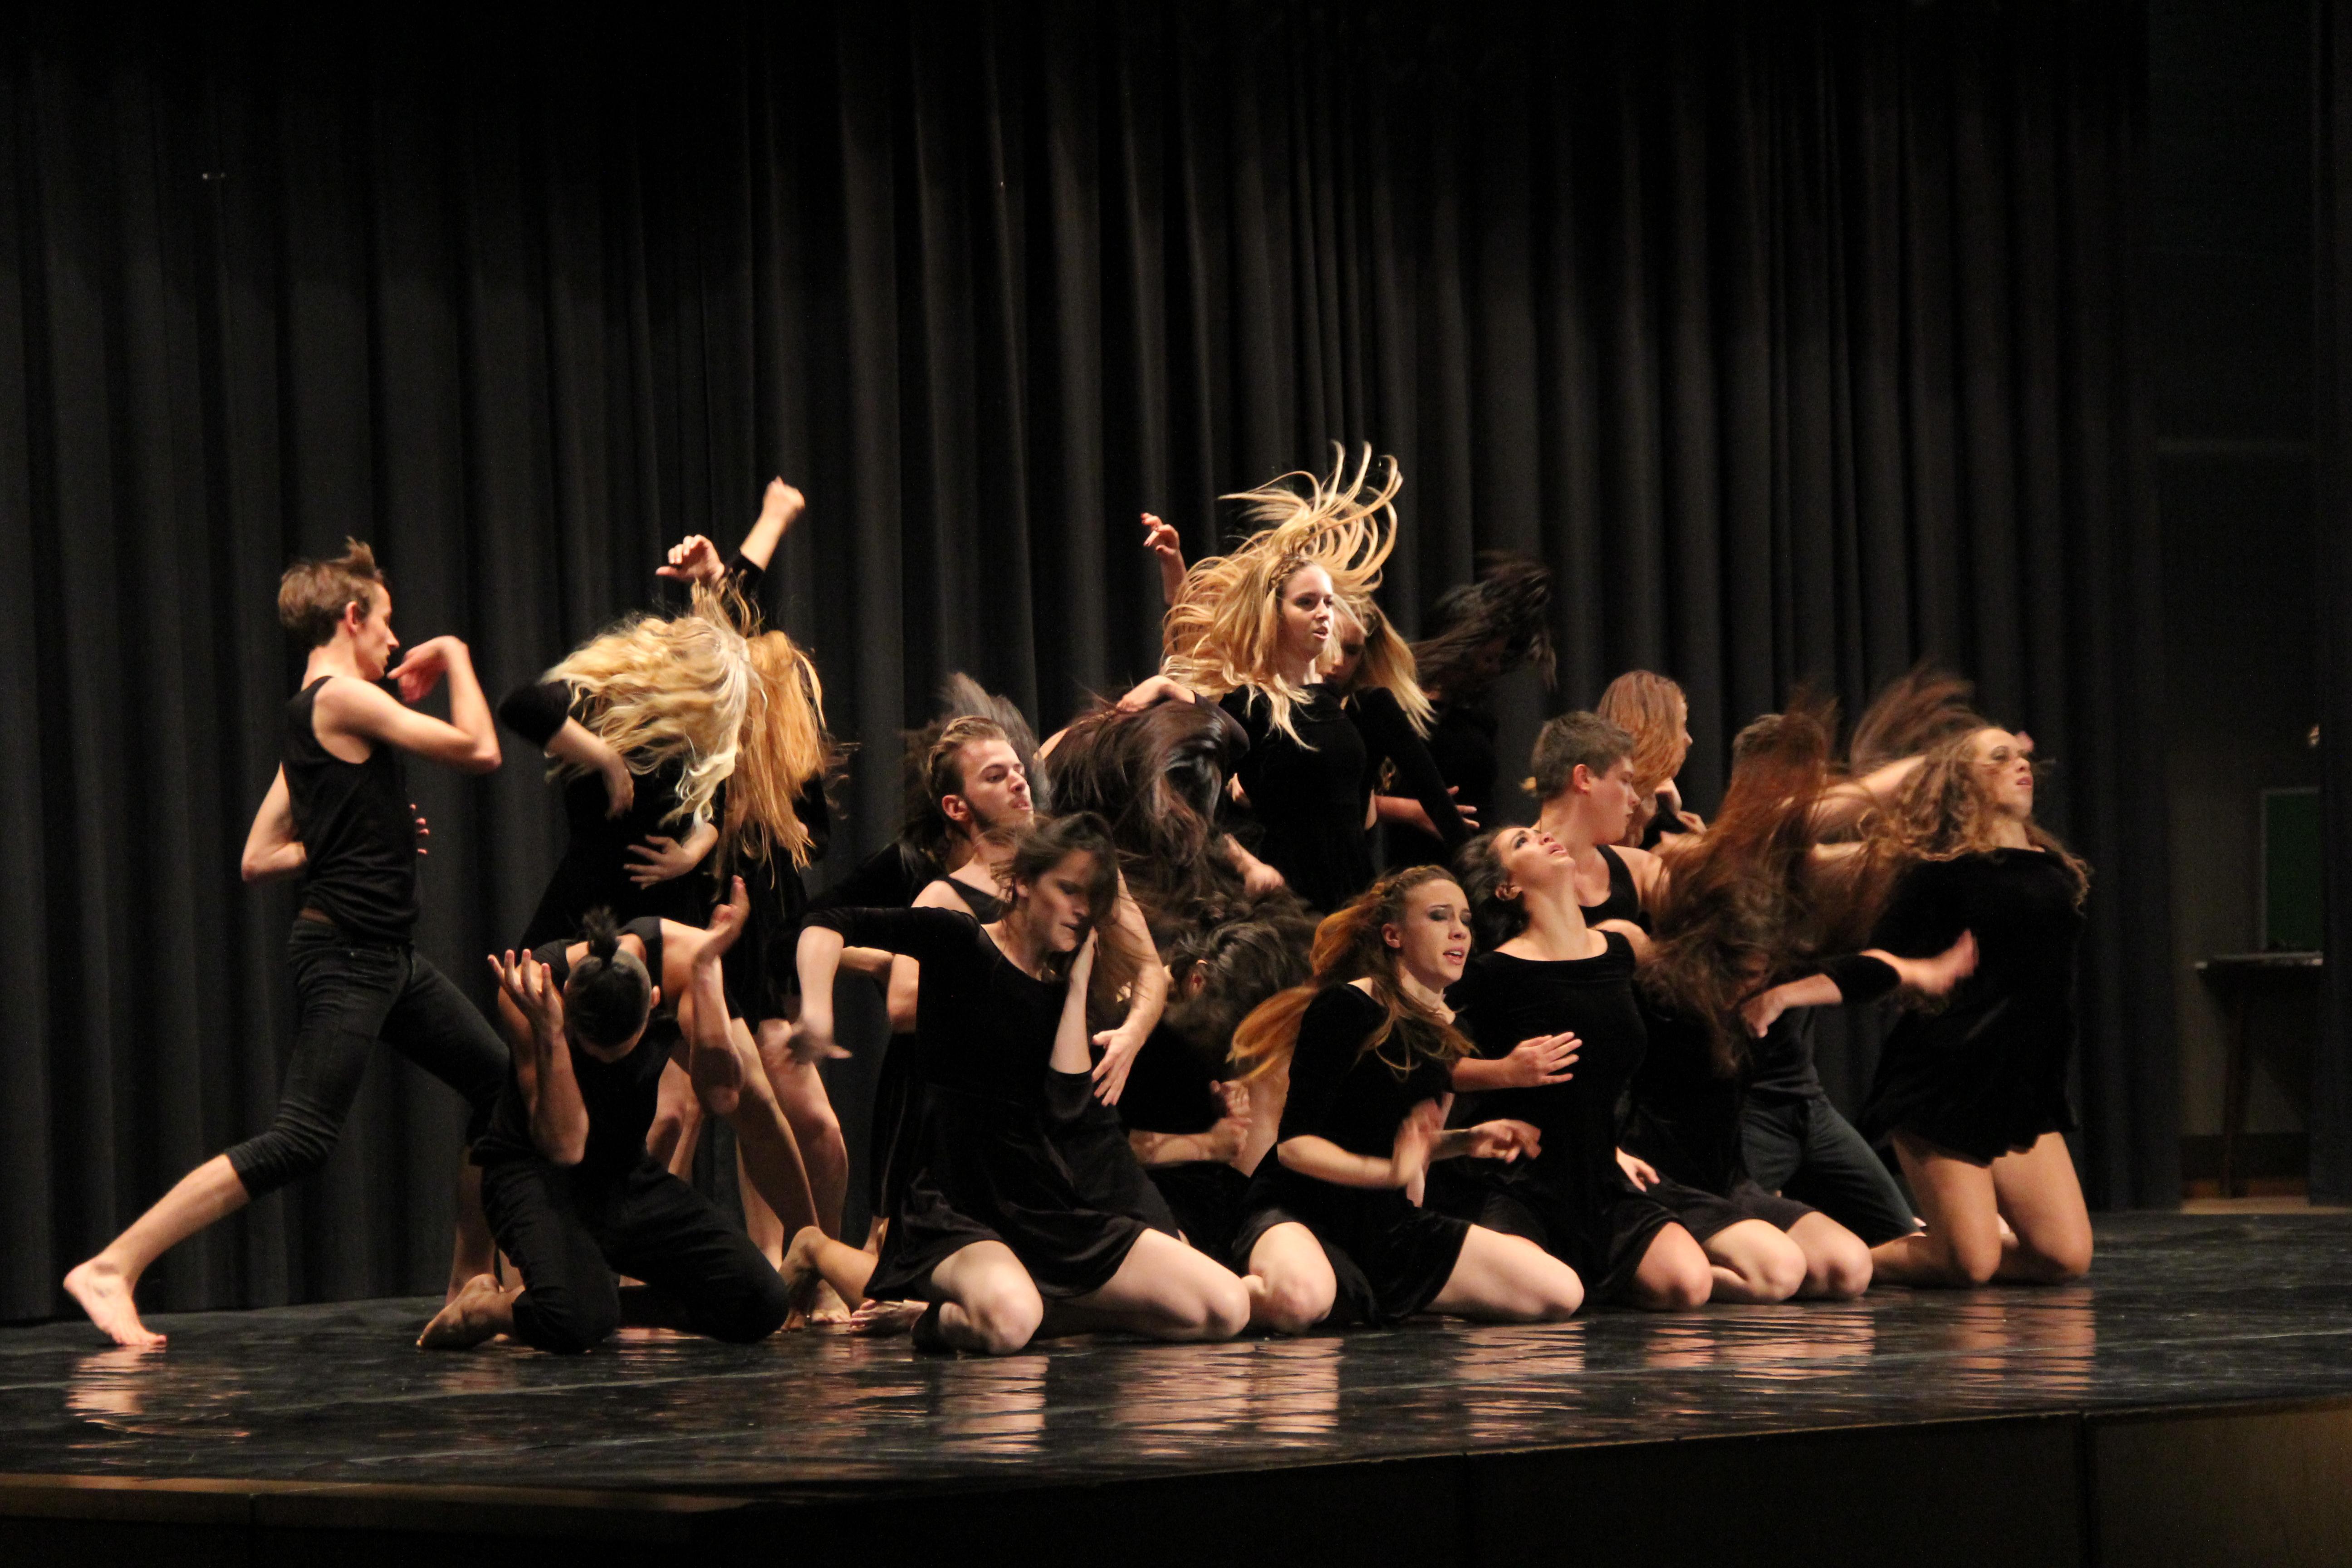 Dance contest 2013 - Switzerland